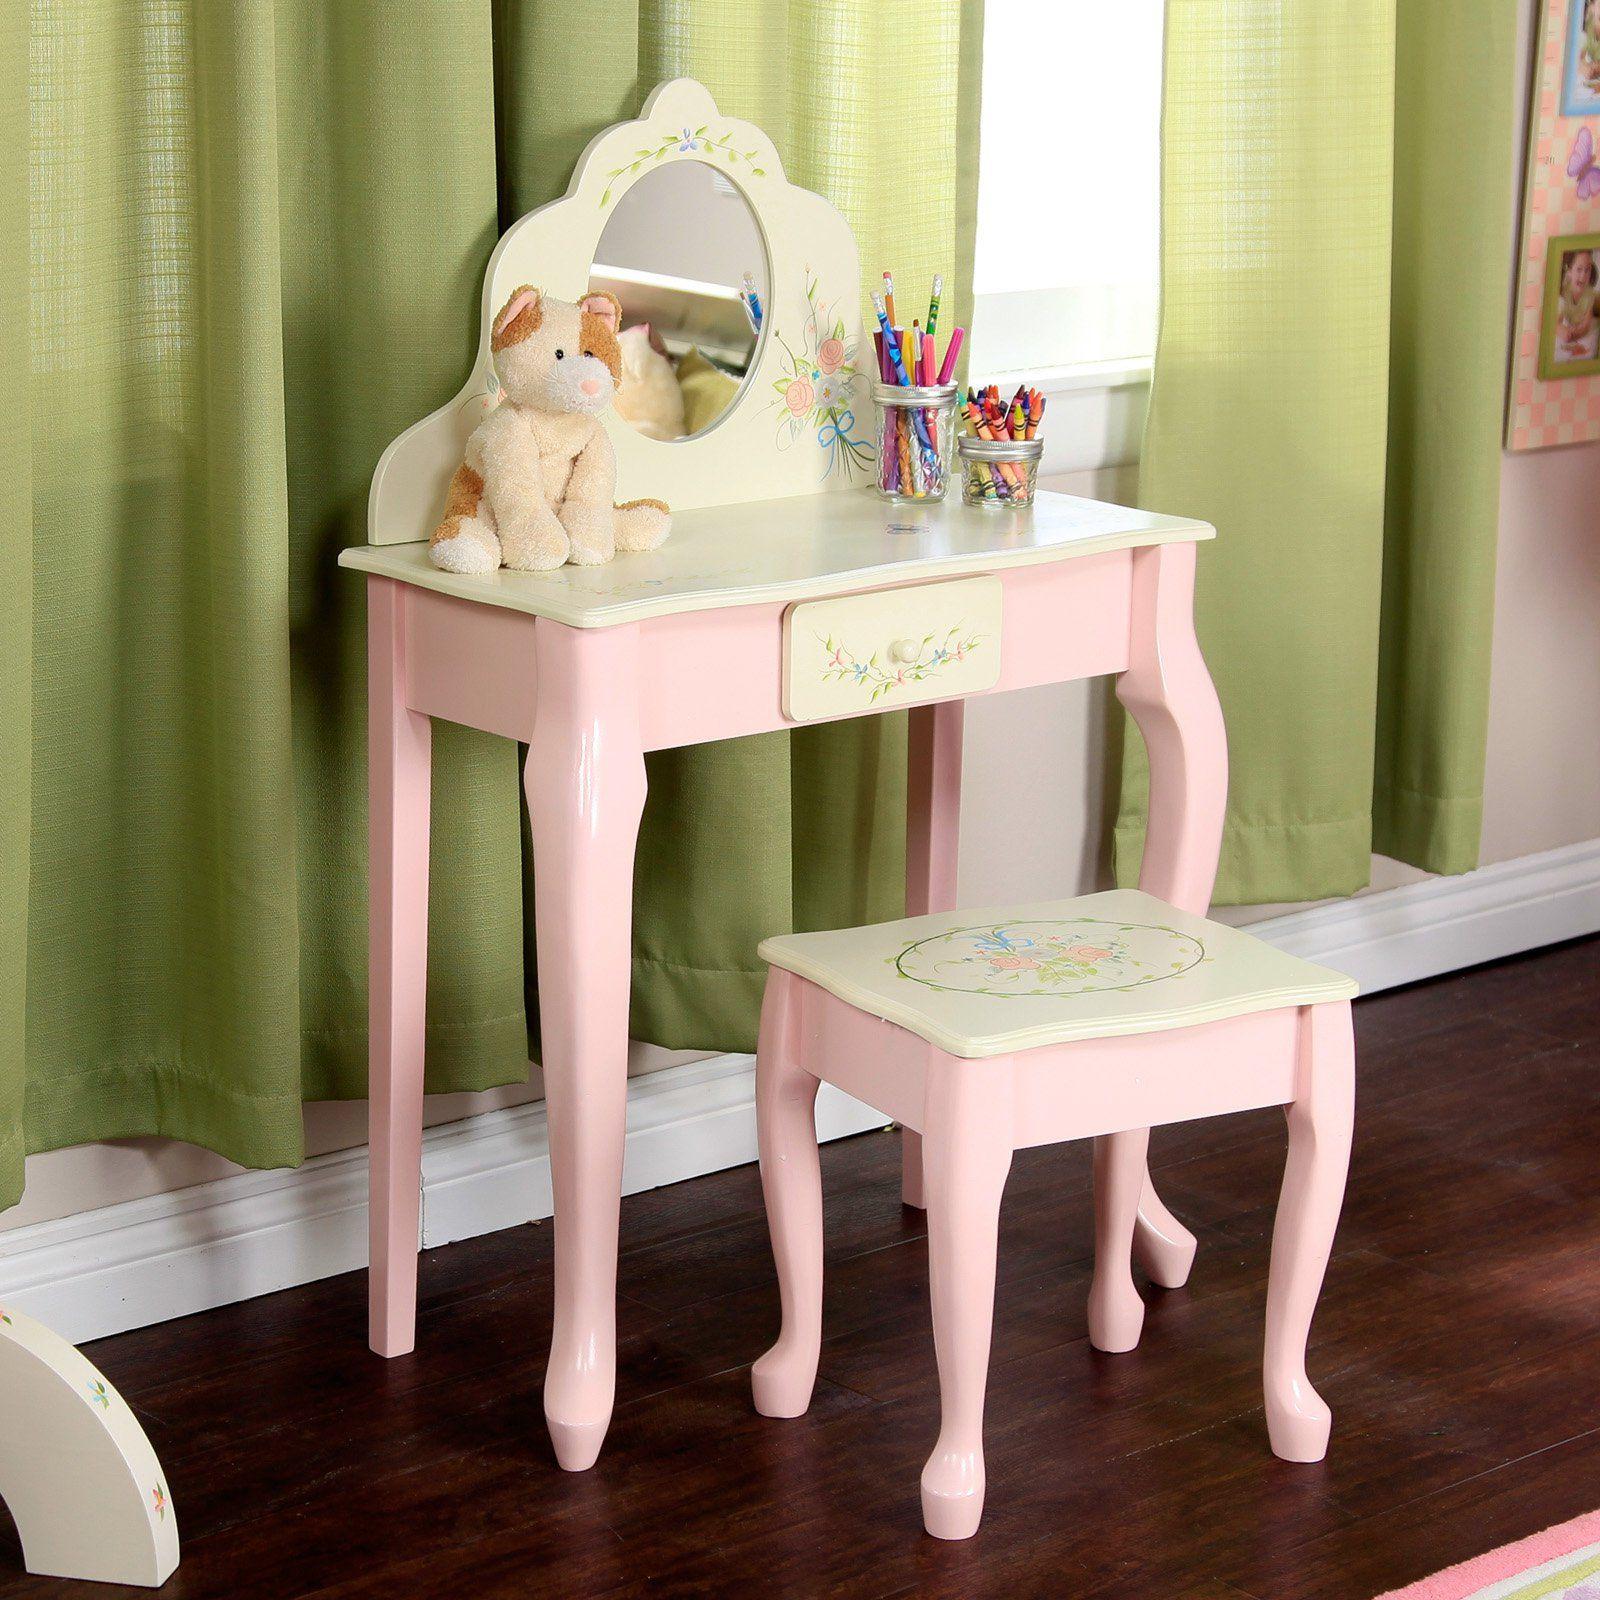 Fantasy Fields Bouquet S Oval Mirror Bedroom Vanity Stool Set 152 2 Hayneedle